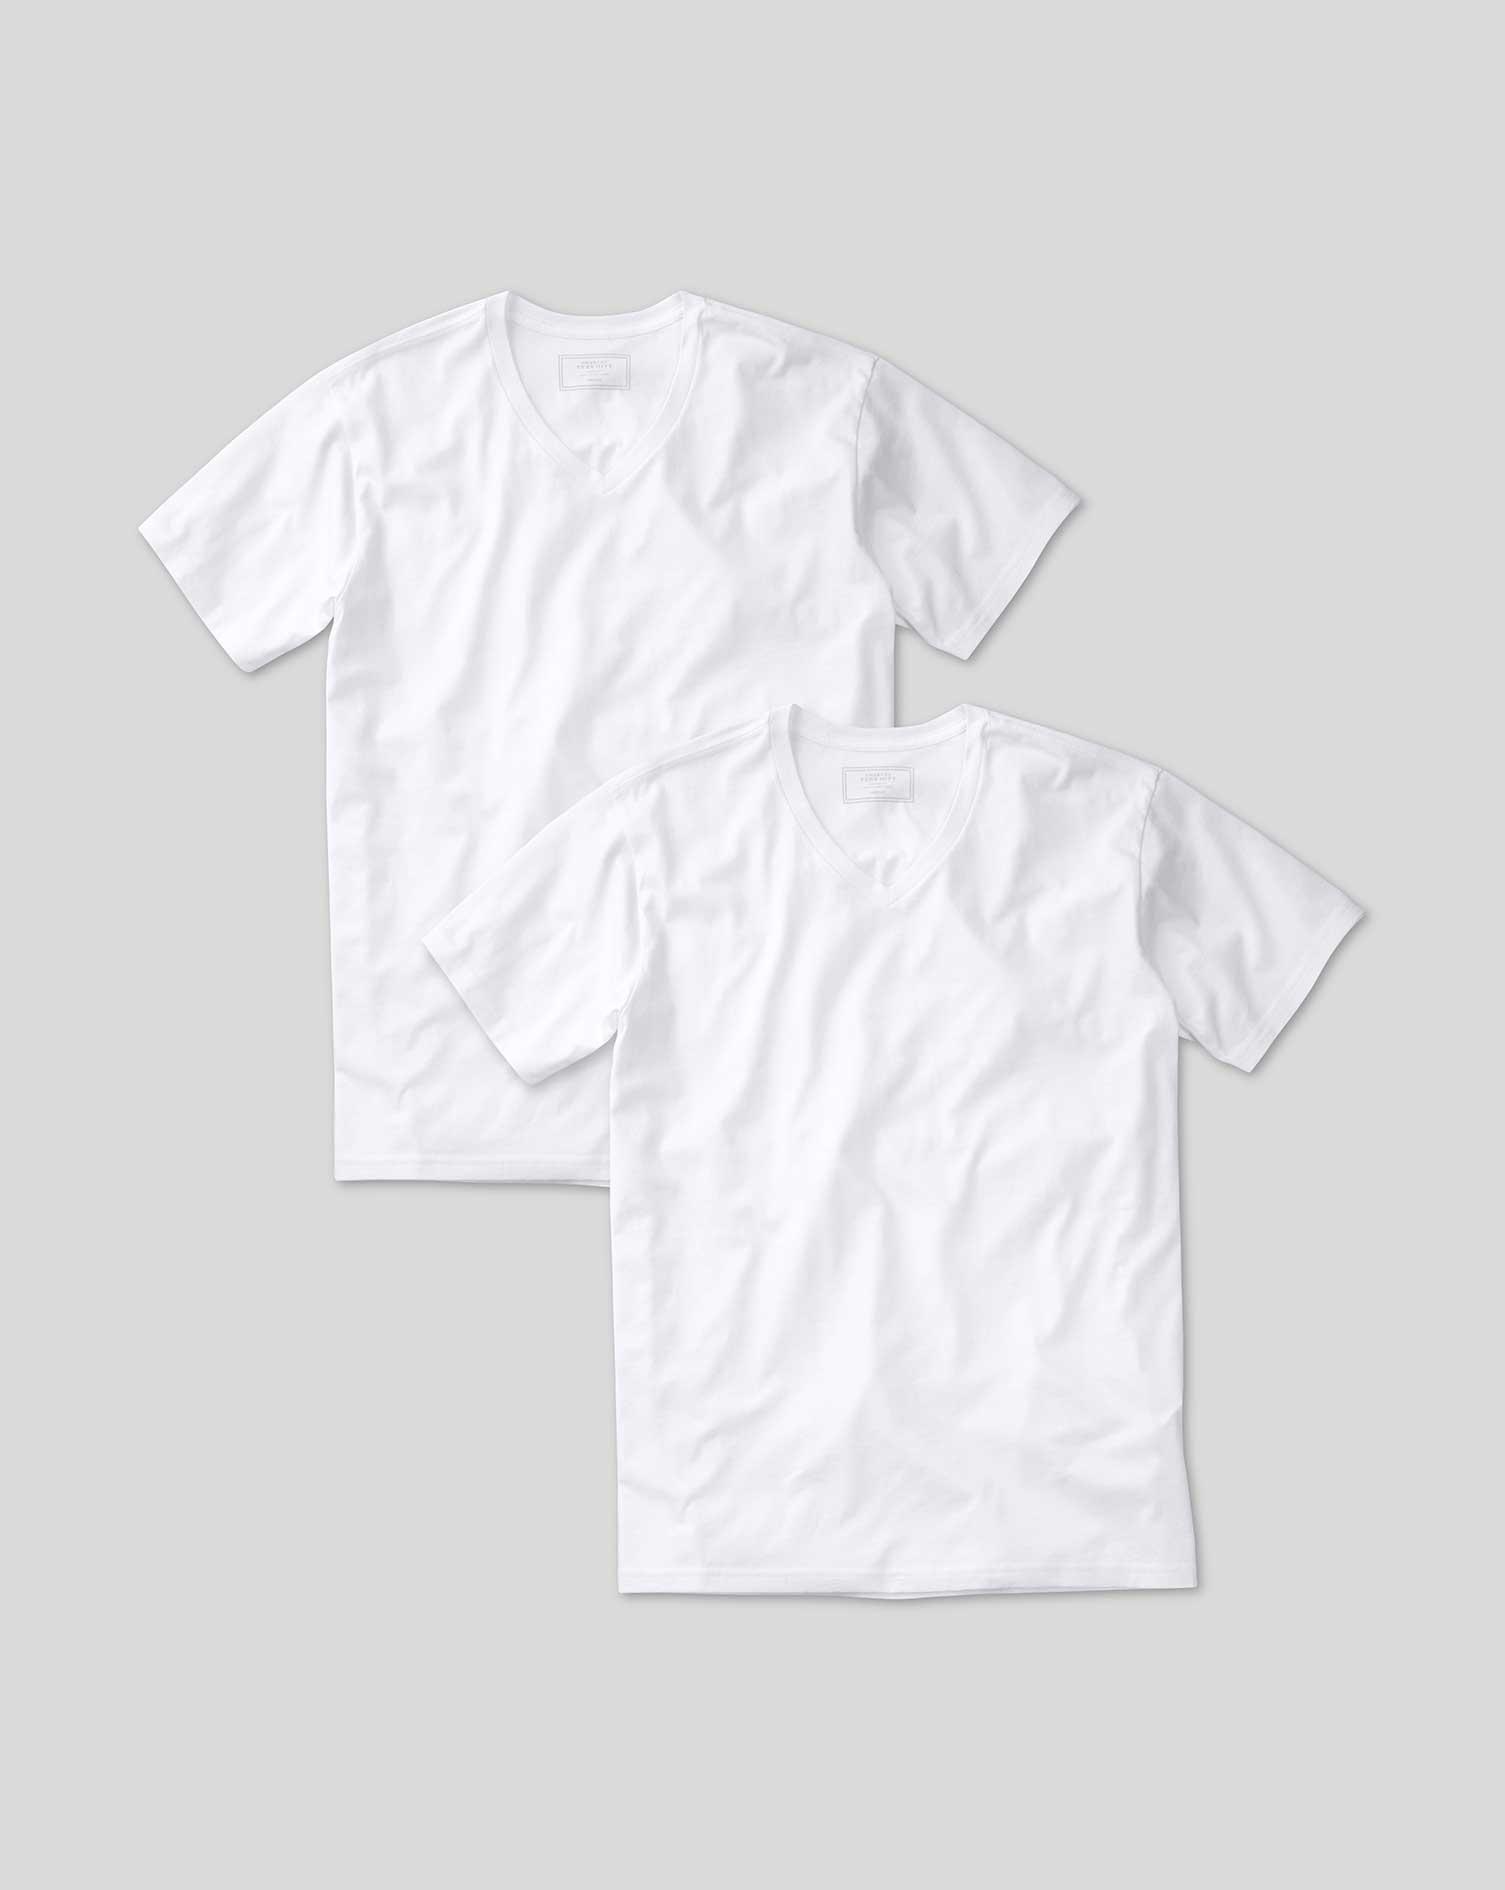 Image of Charles Tyrwhitt 2 Pack White V-Neck Cotton Undershirt T-Shirts Size Large by Charles Tyrwhitt